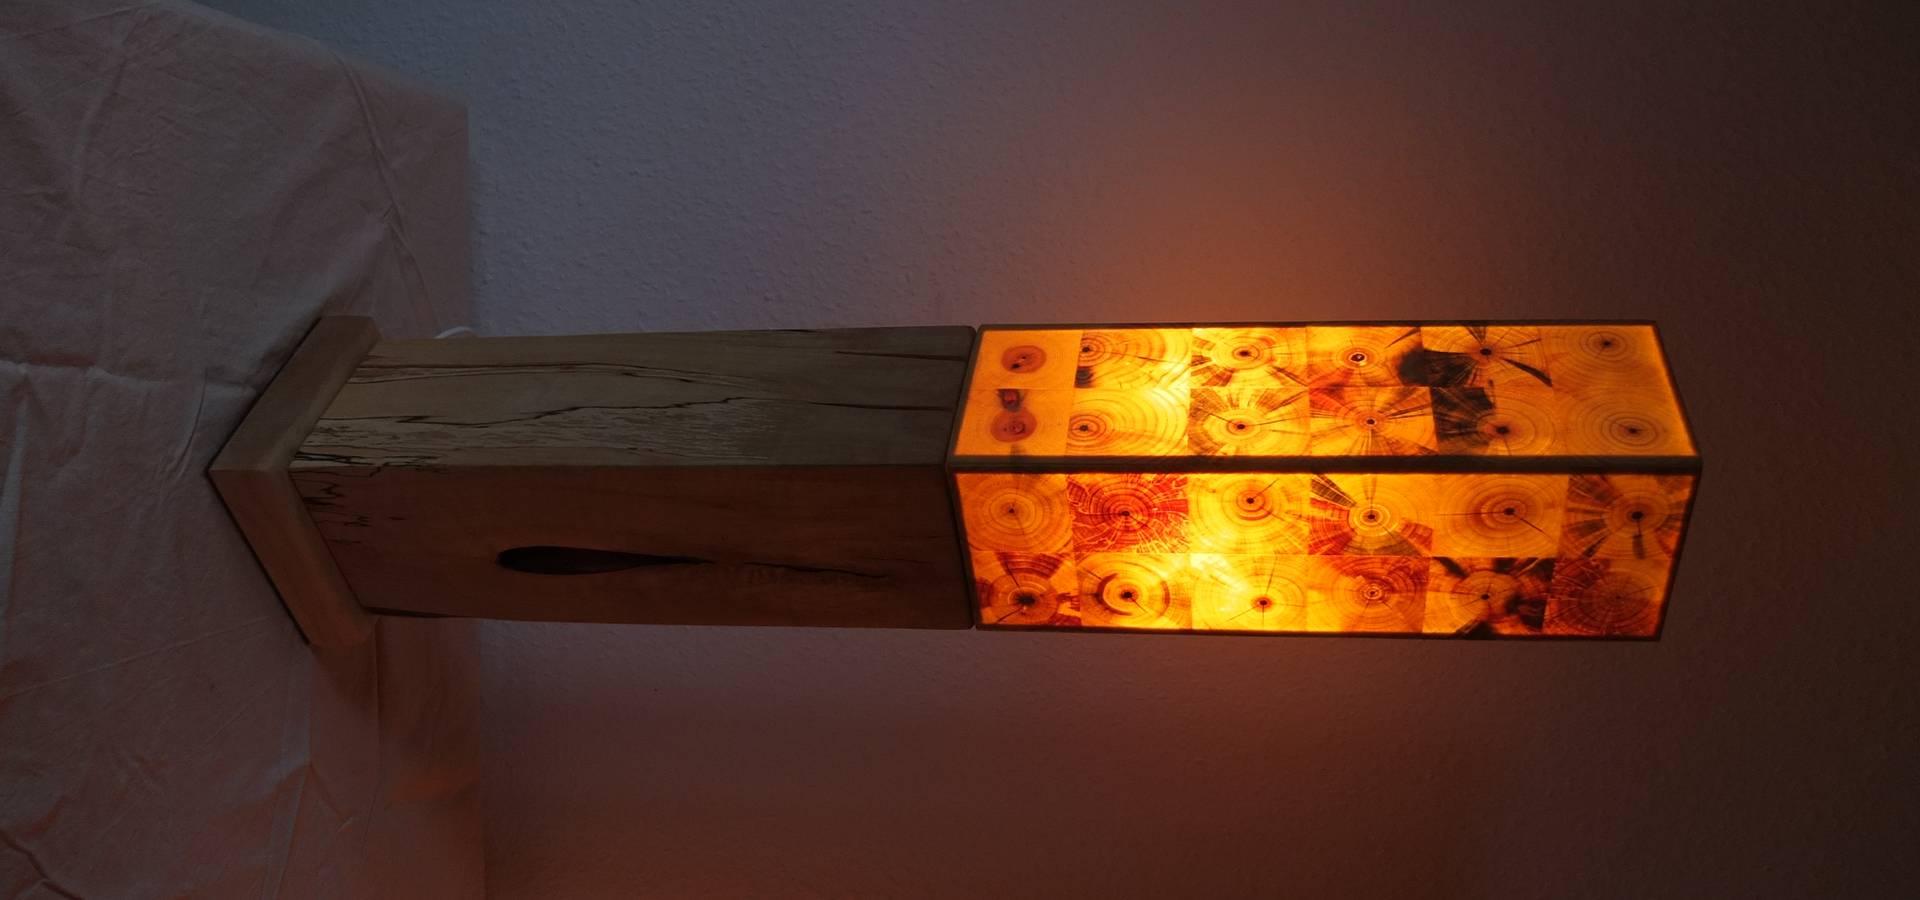 stehlampen s ulen mit durchscheinendem hirnholz by holz leuchtet homify. Black Bedroom Furniture Sets. Home Design Ideas